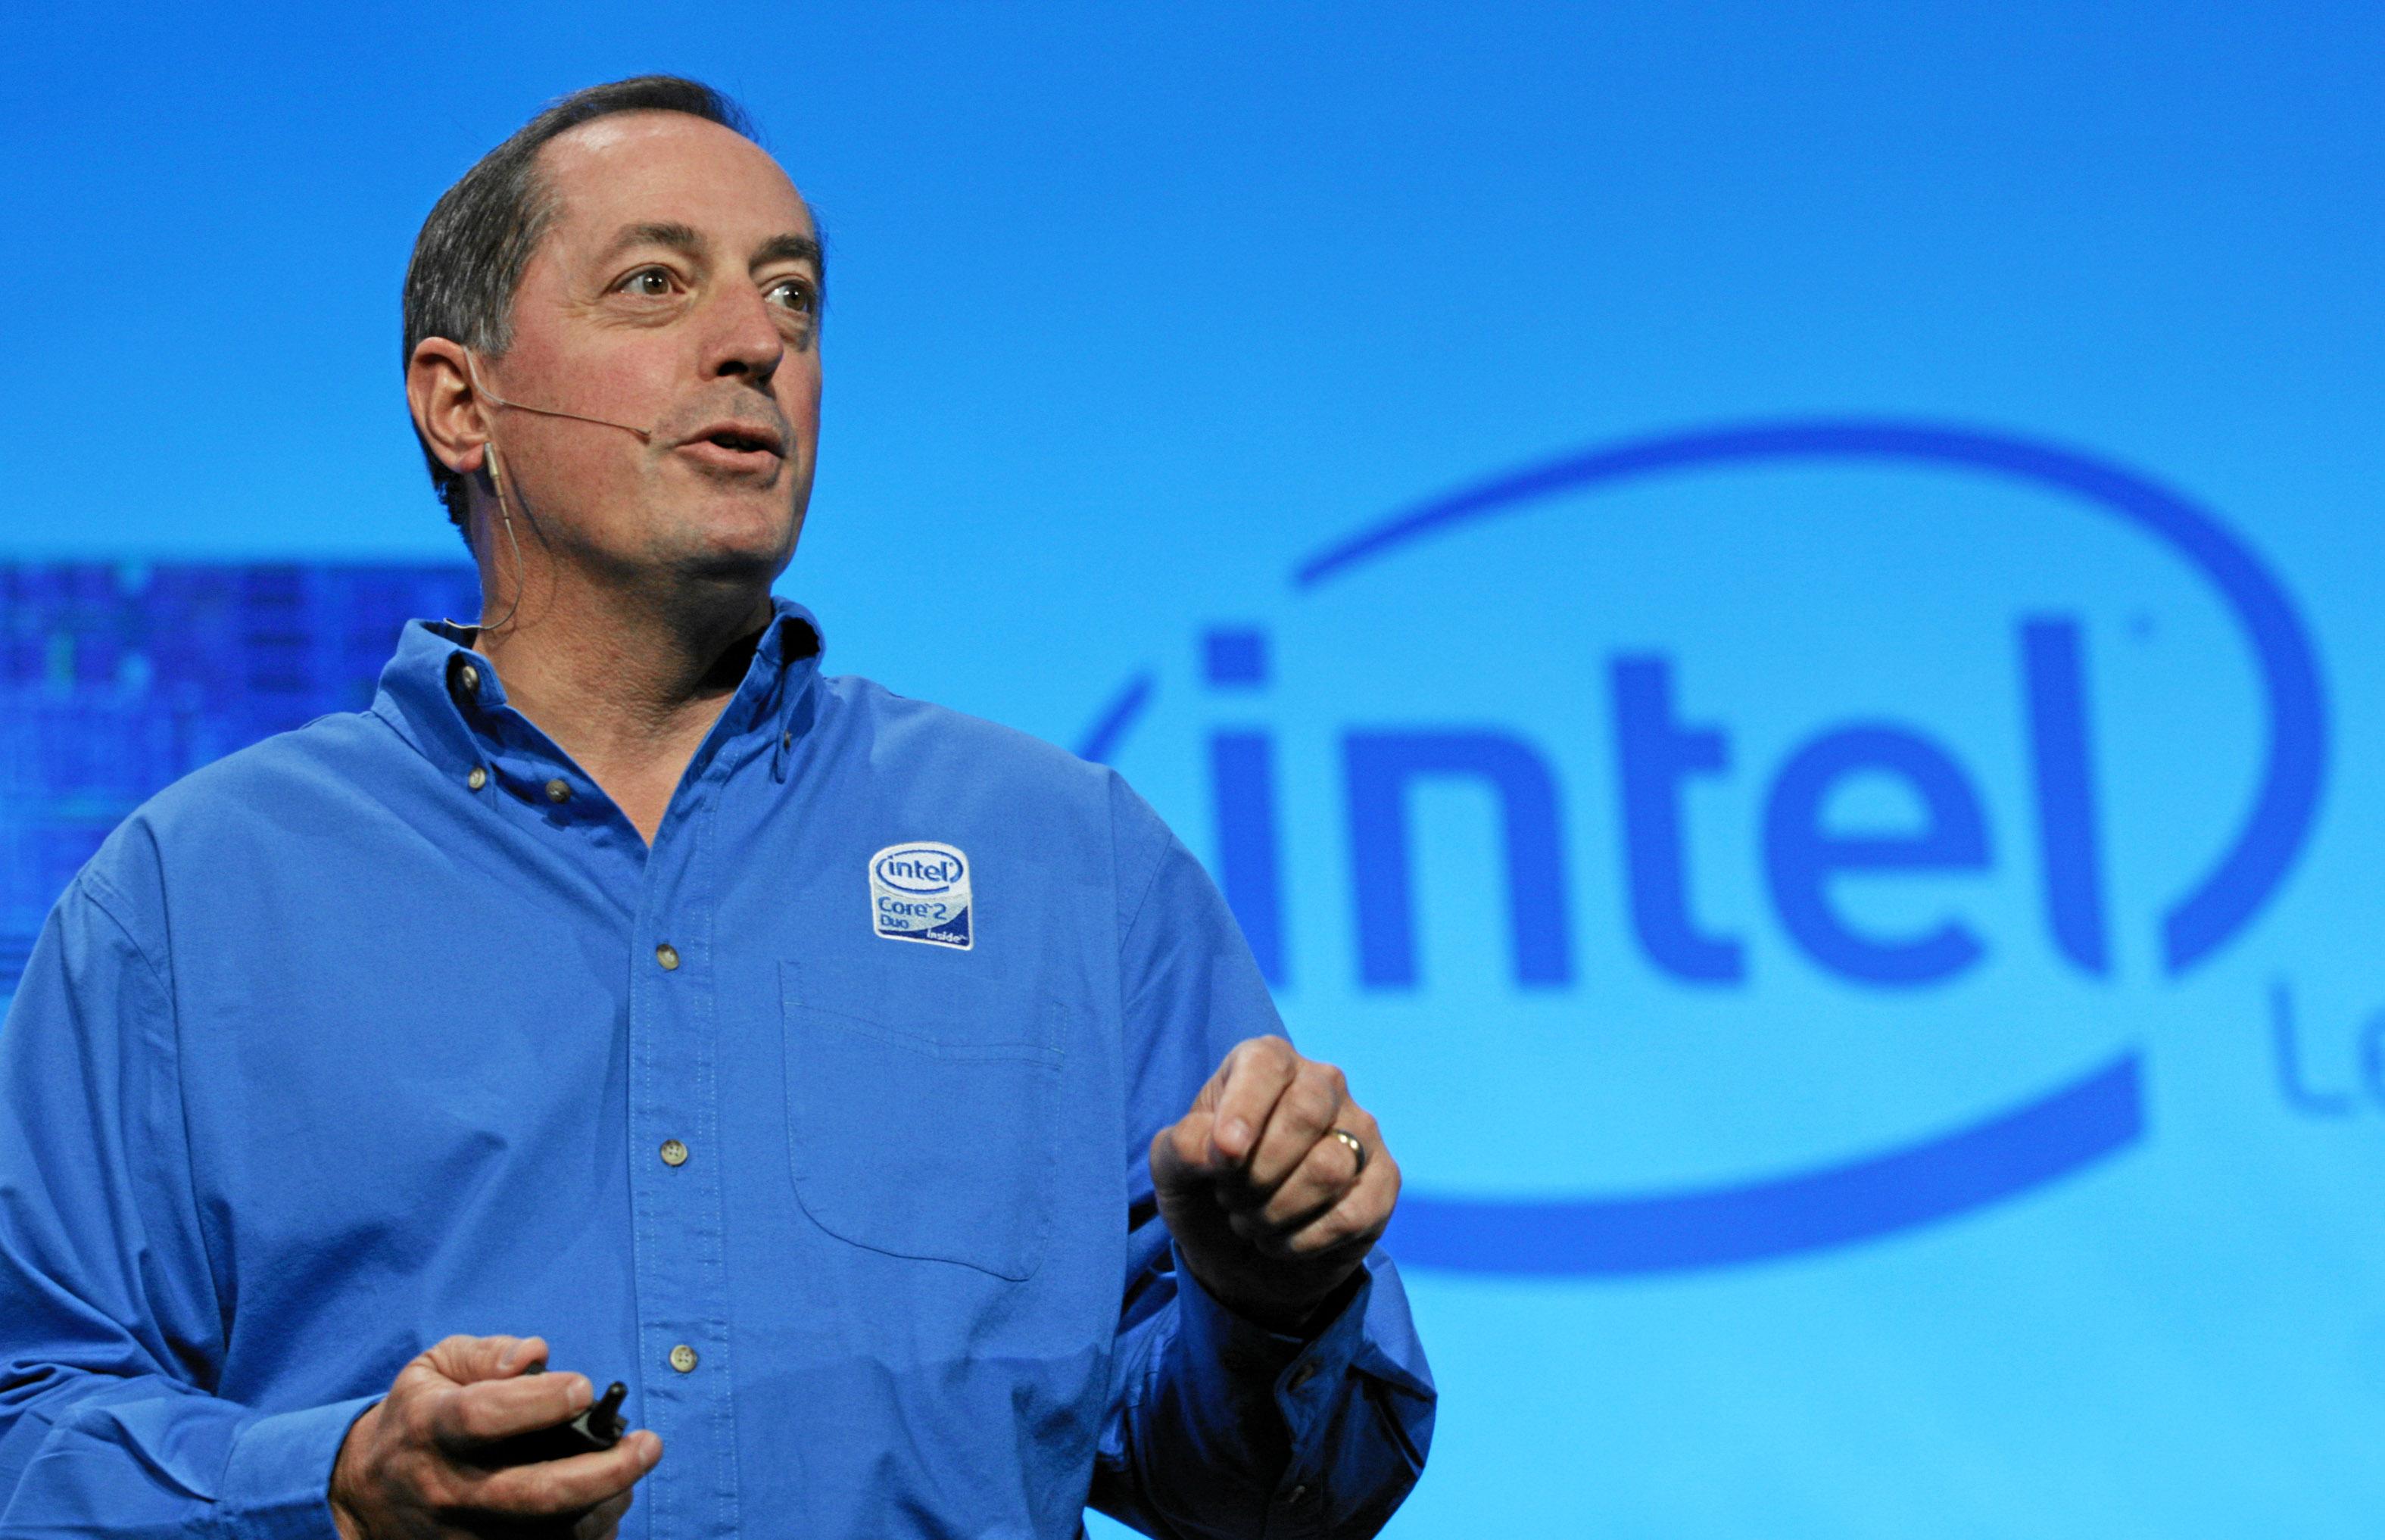 Intel-CEO-Paul-Otellini-Retiring-In-May-2013